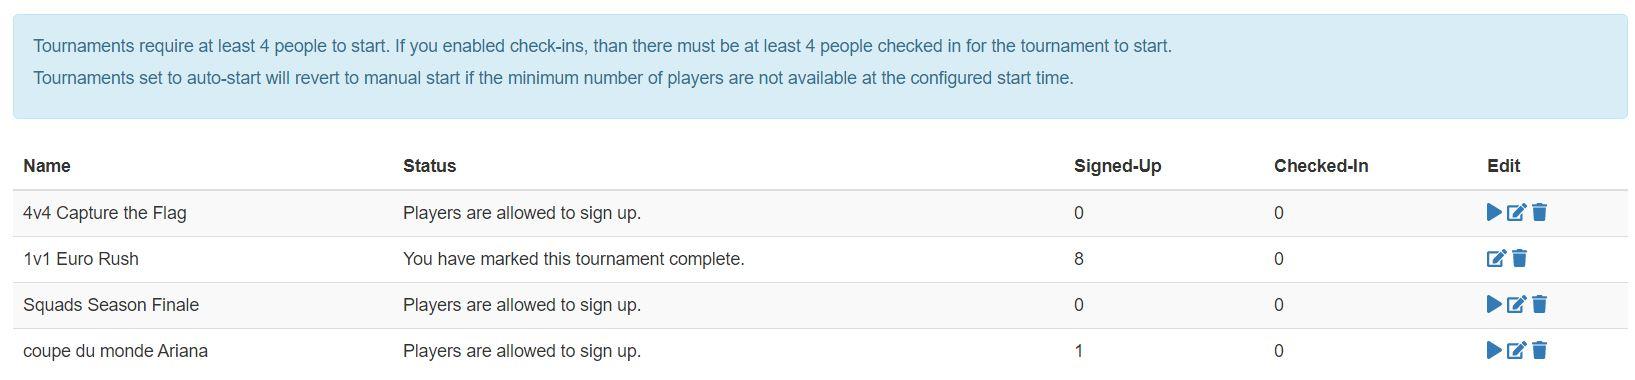 Active Tournaments